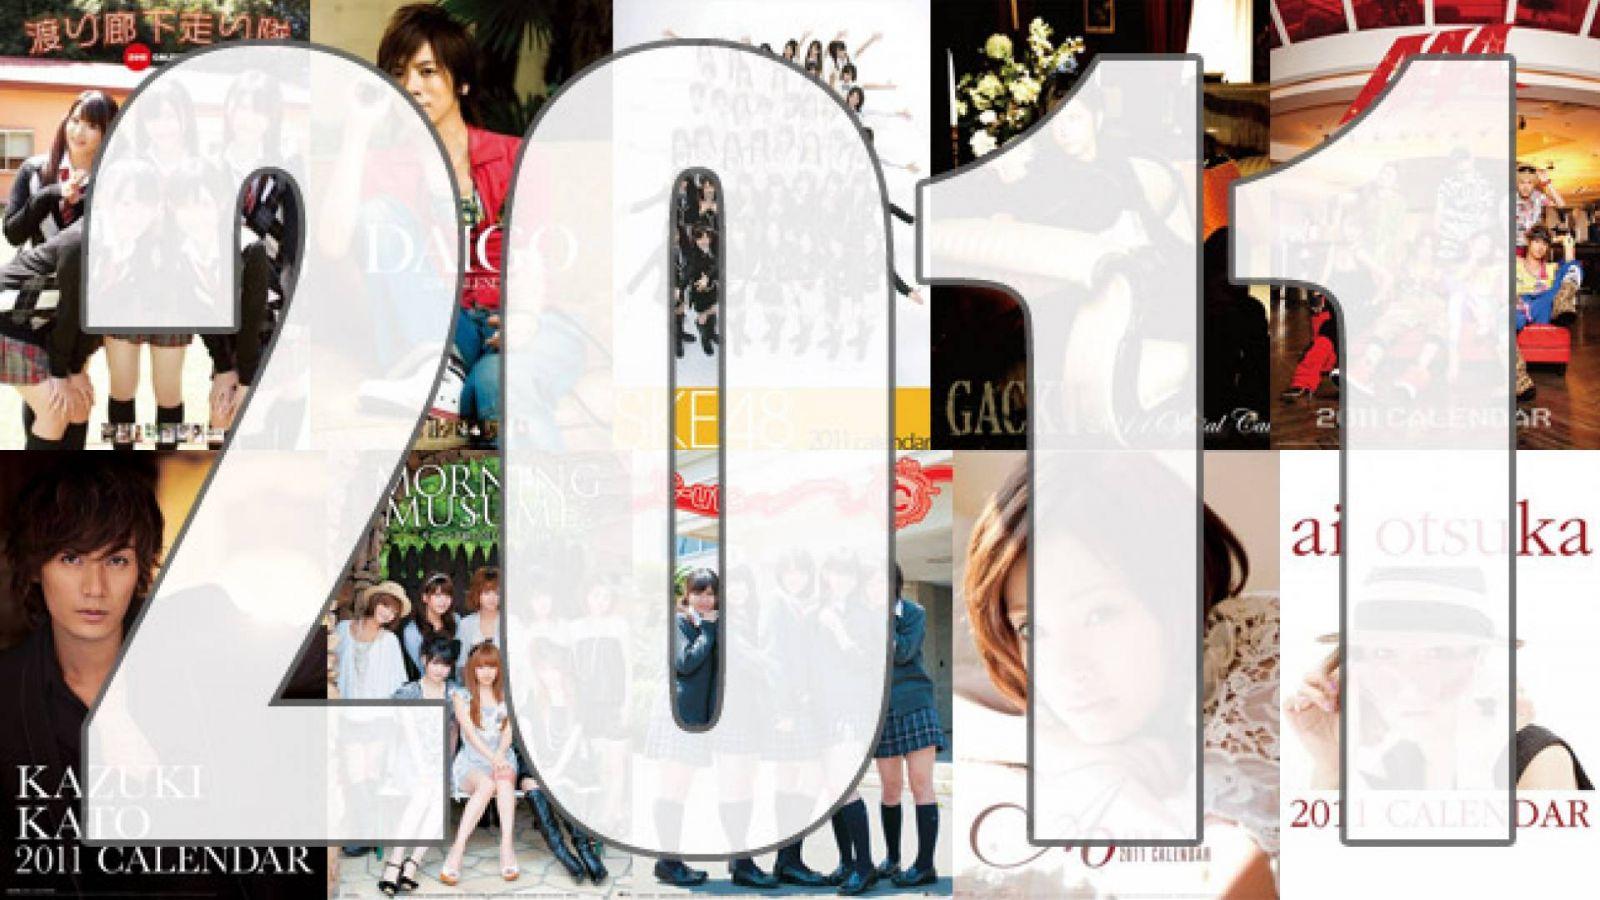 Calendarios para 2011 © All rights reserved